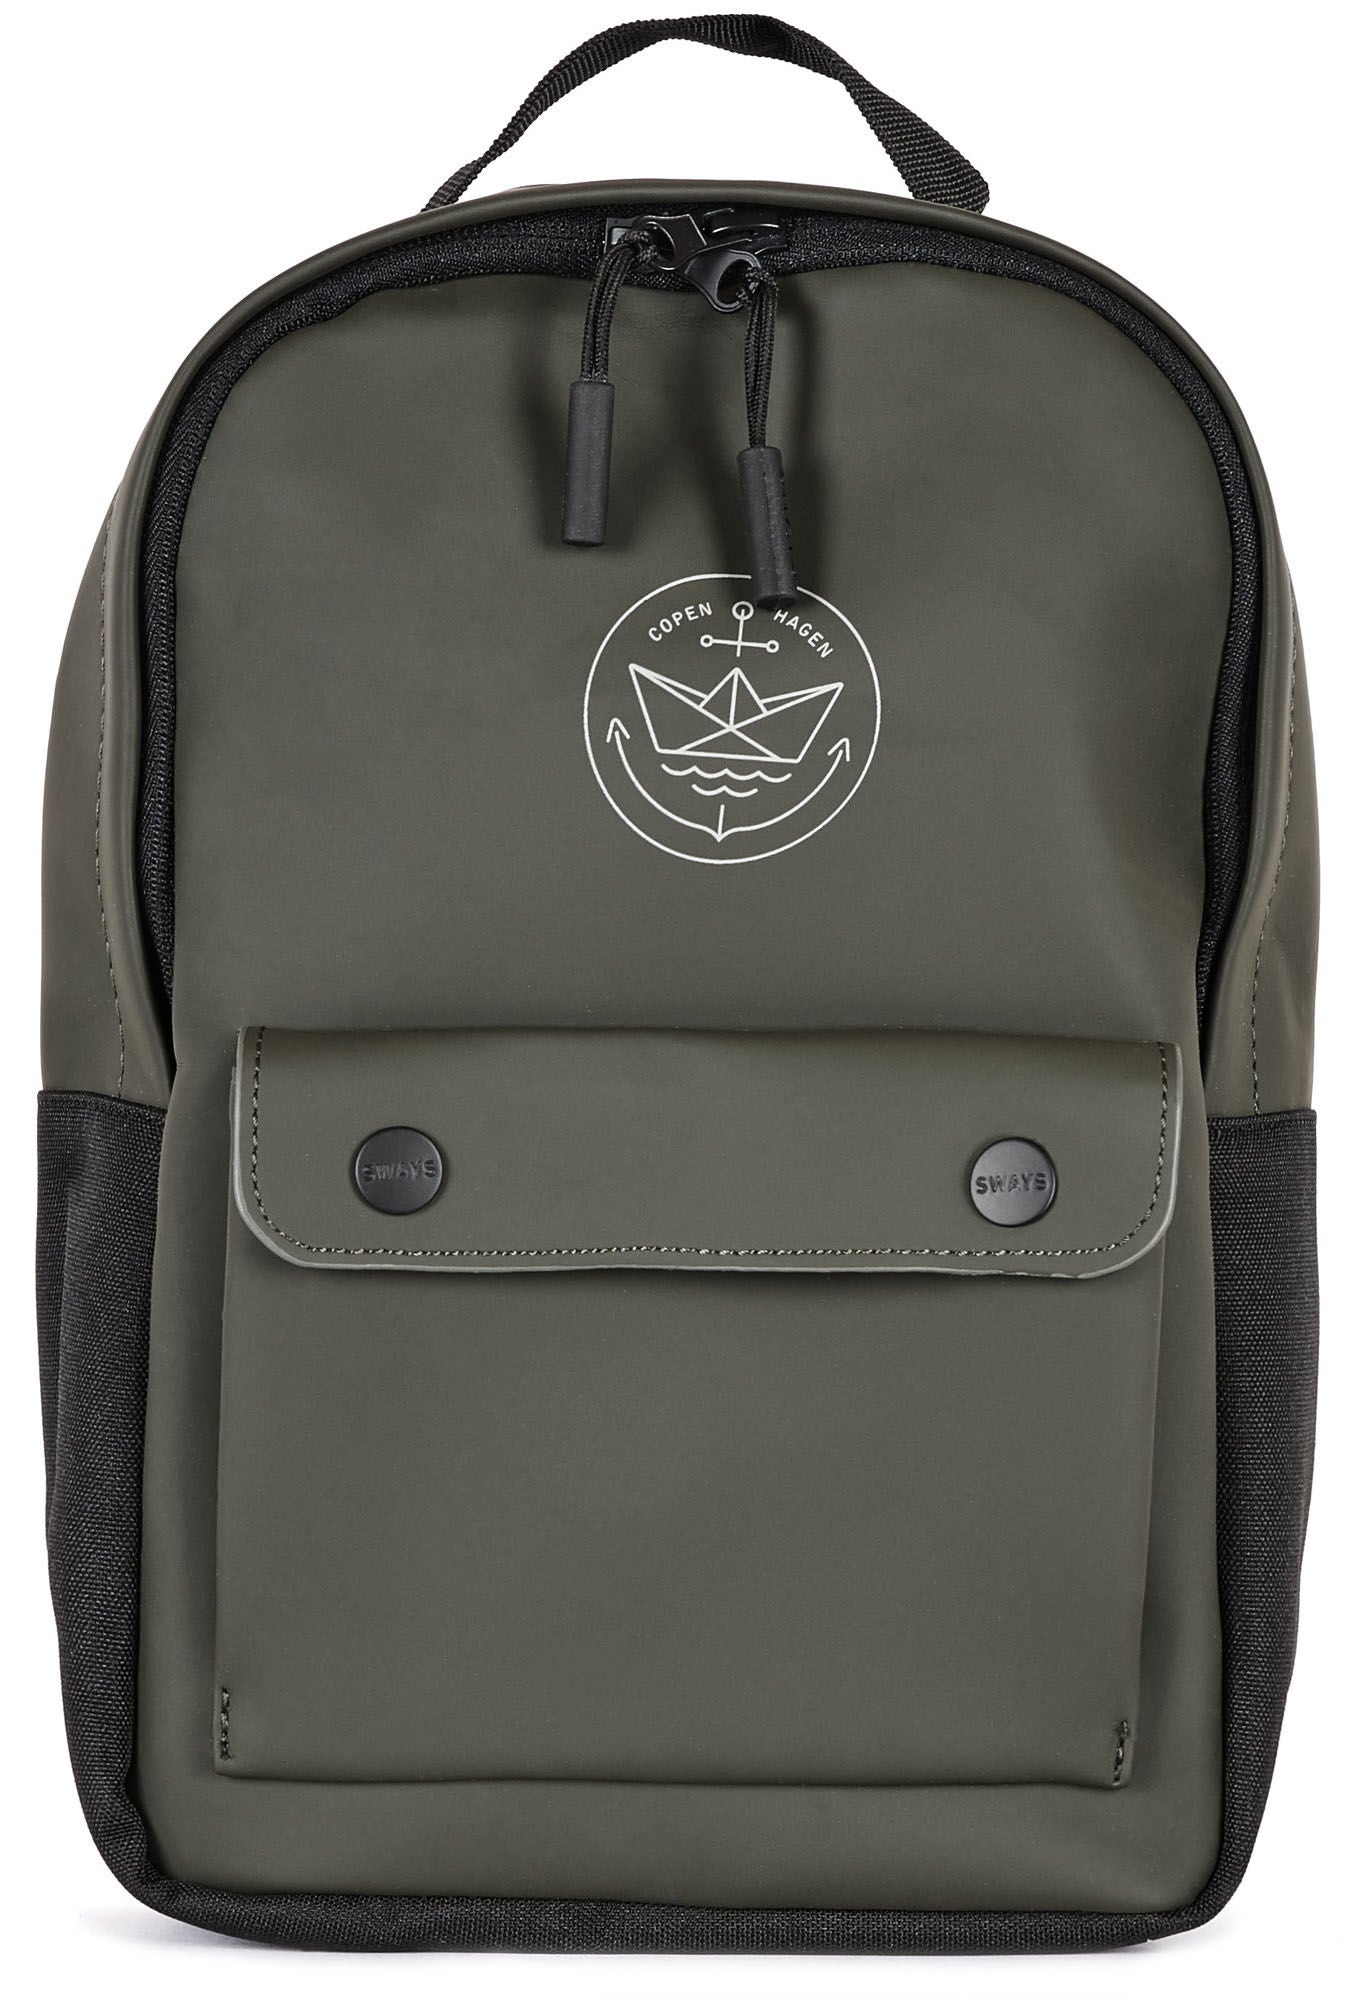 SWAYS Cargo Bag Mini Ryggsäck, Green